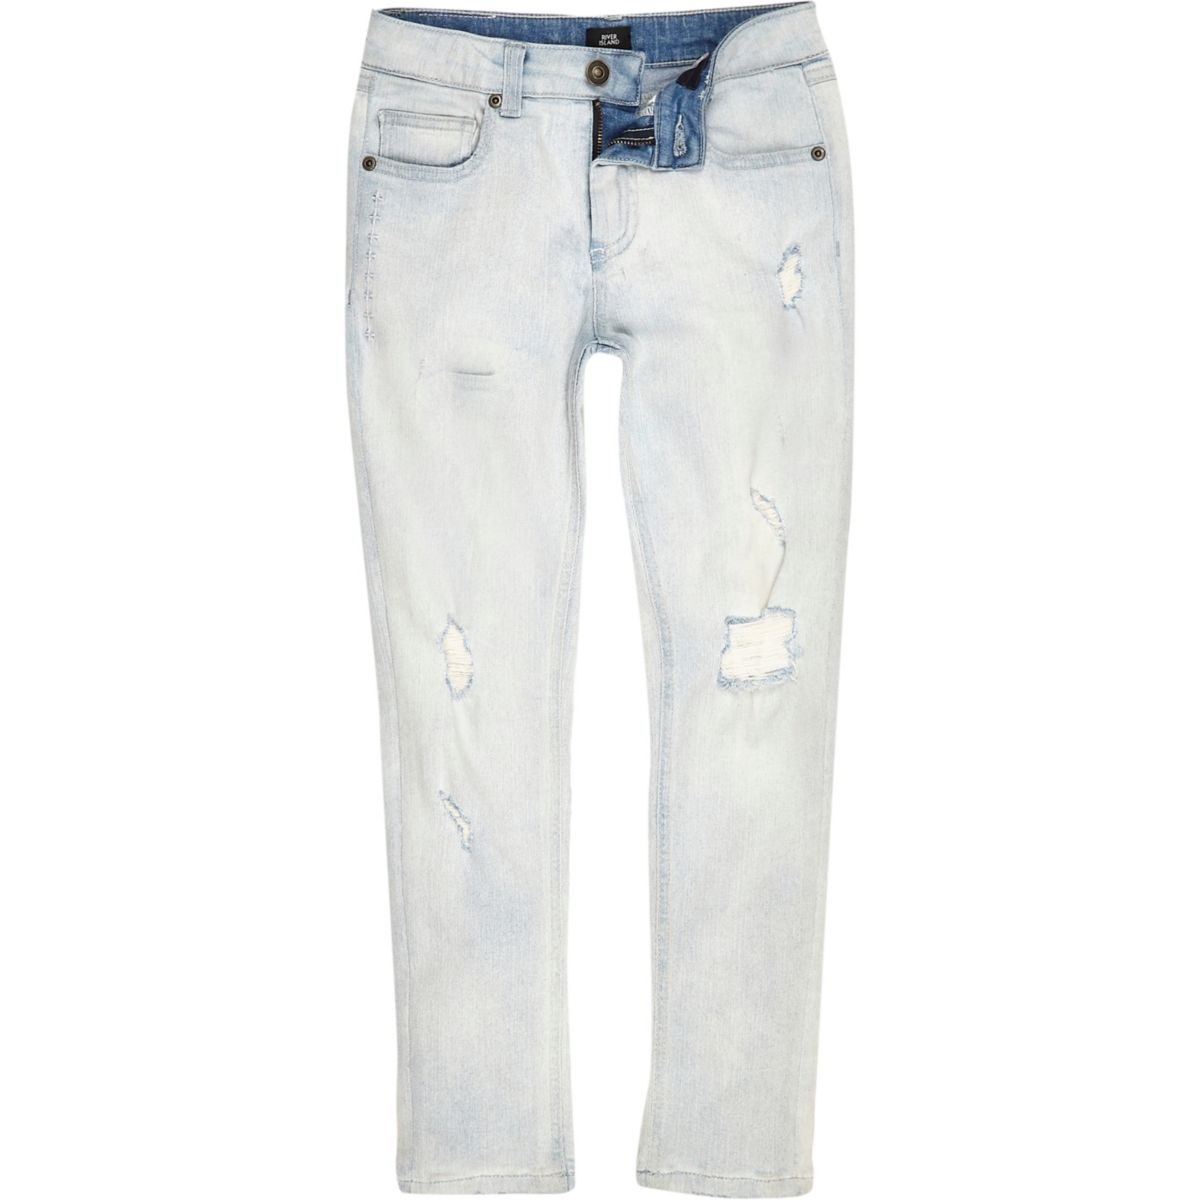 Boys light blue wash ripped Sid skinny jeans